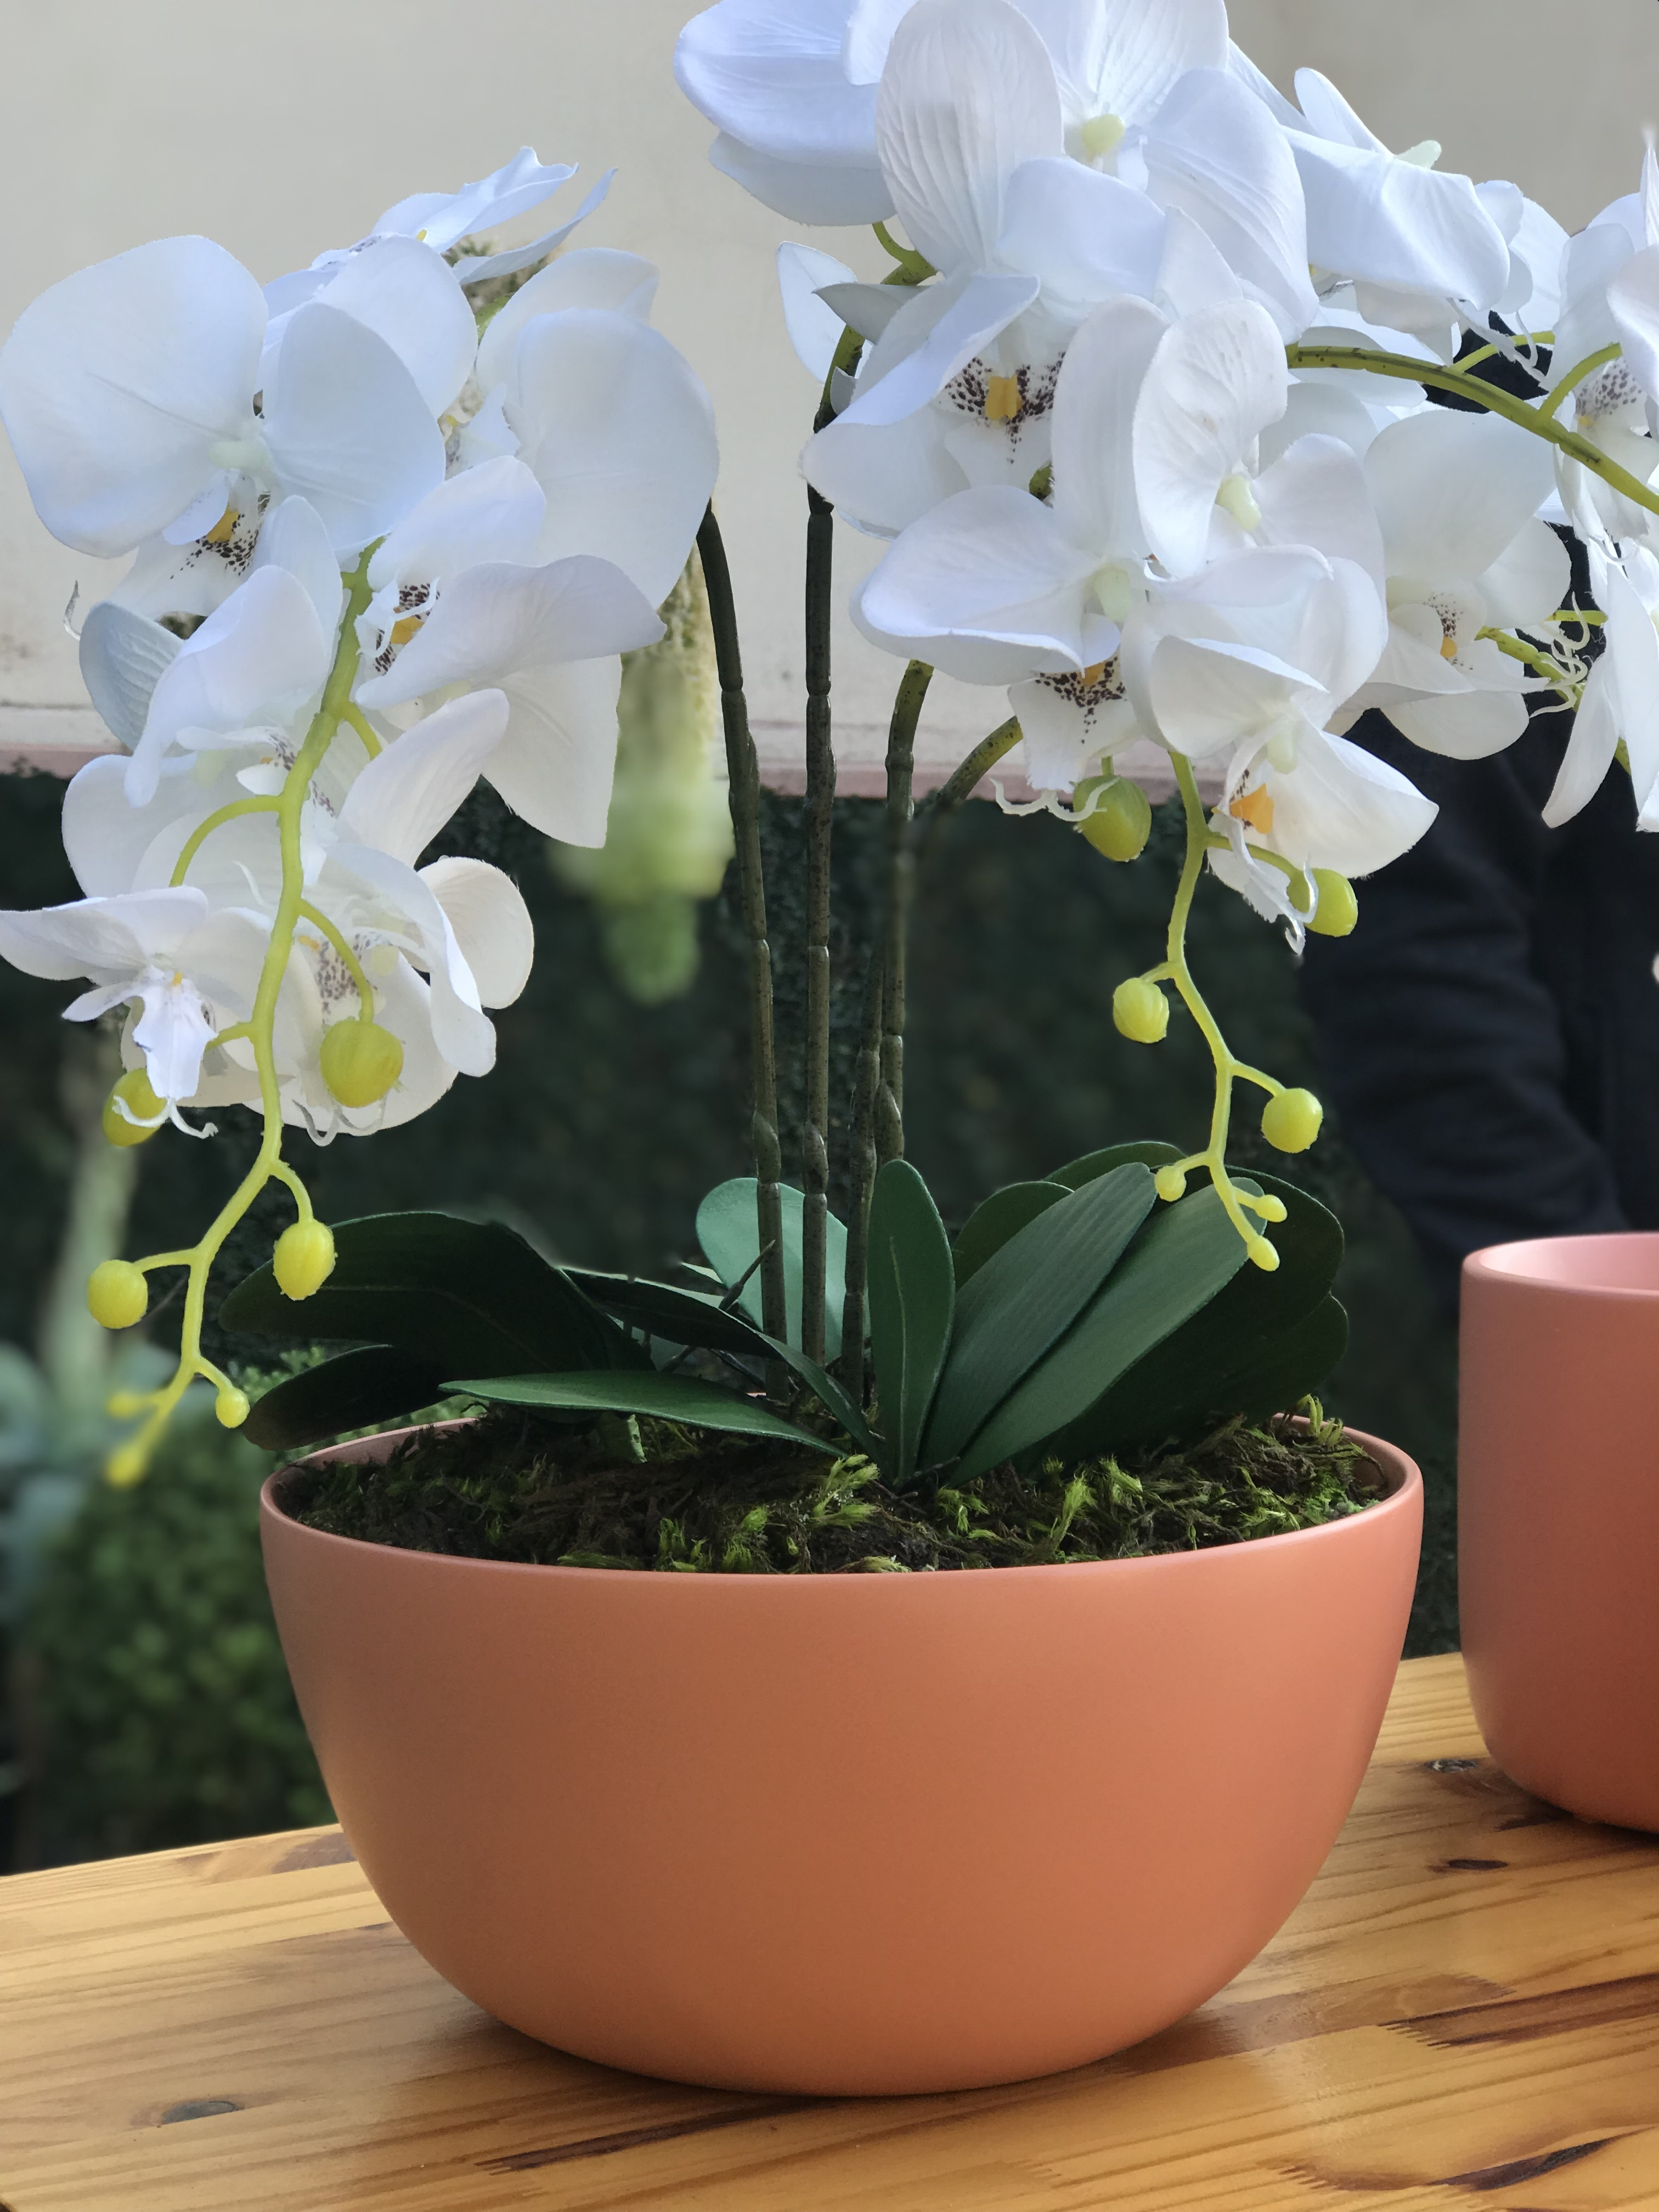 Arranjo com vaso terracota em cerâmica com orquídea branca